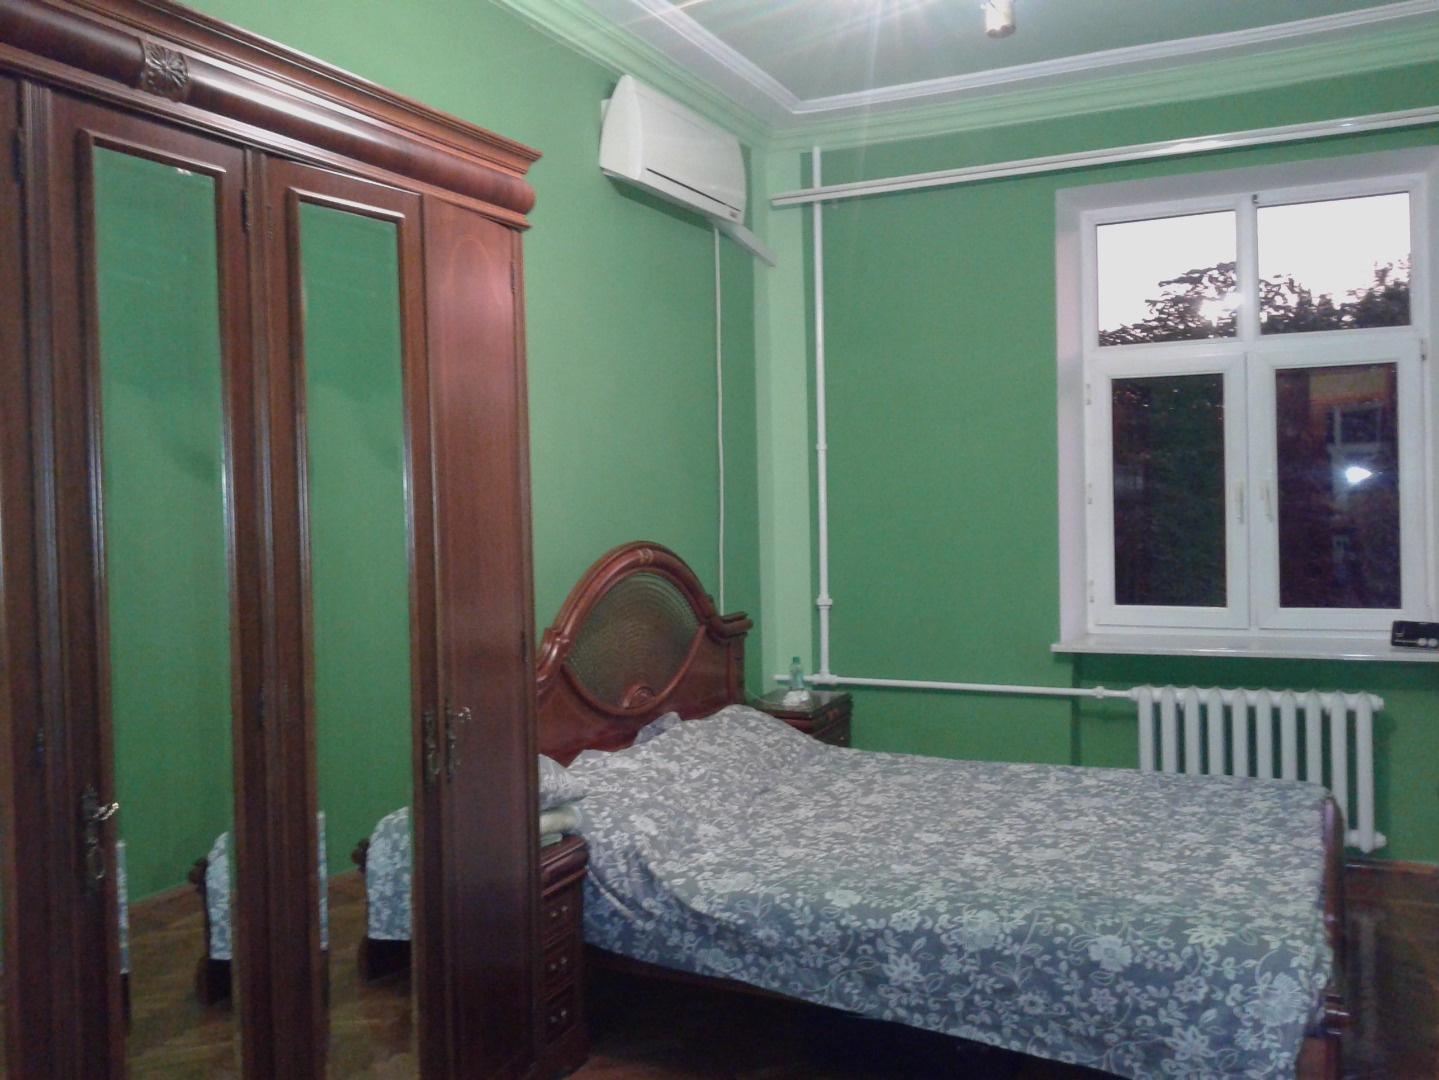 Продается 2-комнатная Квартира на ул. Шевченко Пр. — 90 000 у.е. (фото №9)